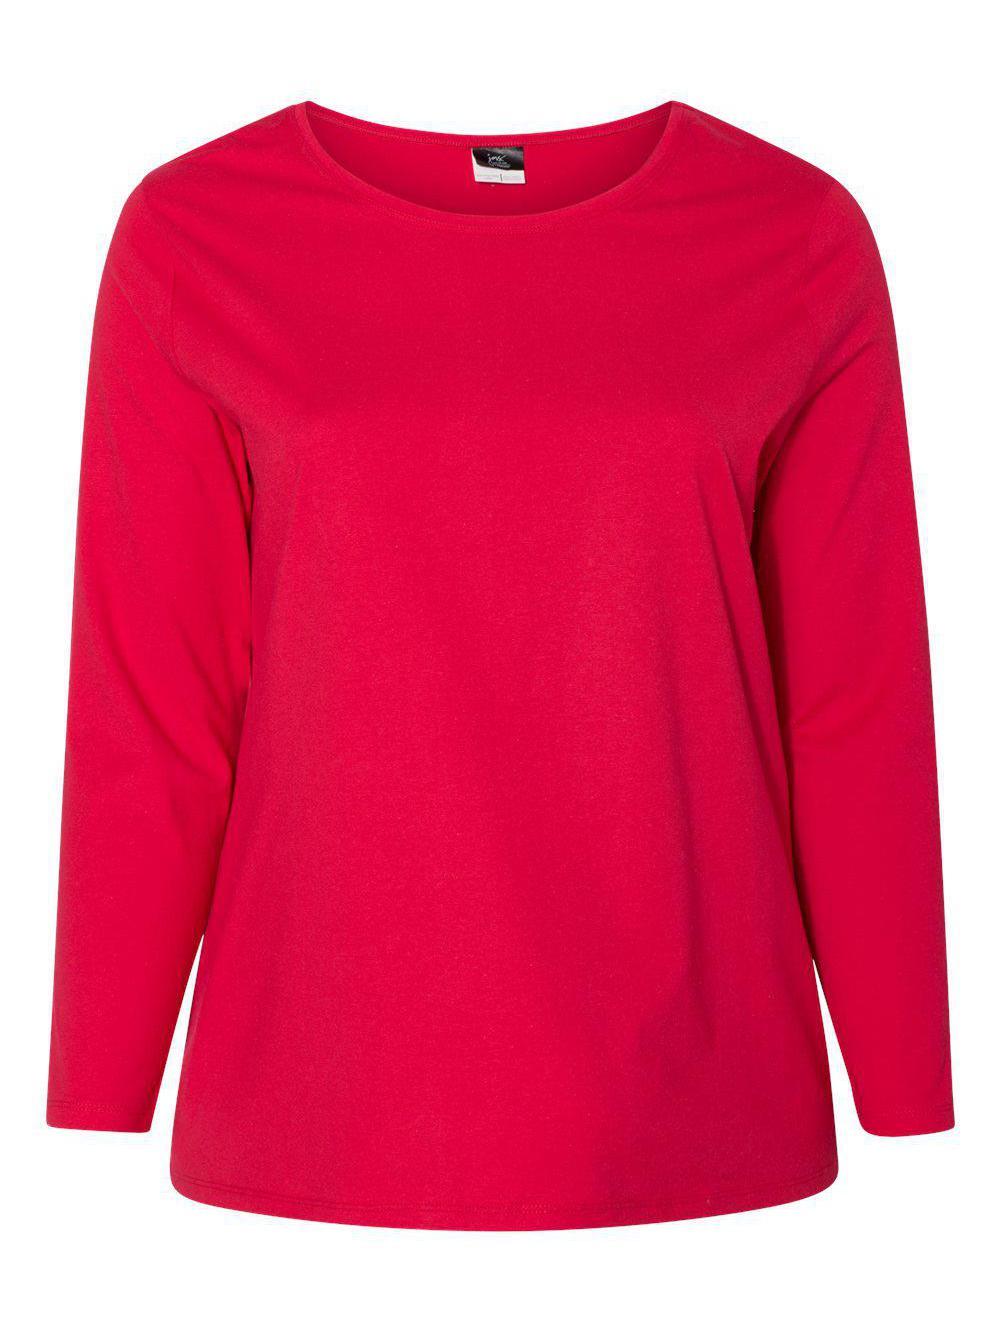 Just-My-Size-Women-039-s-Long-Sleeve-T-Shirt-JMS40 thumbnail 9